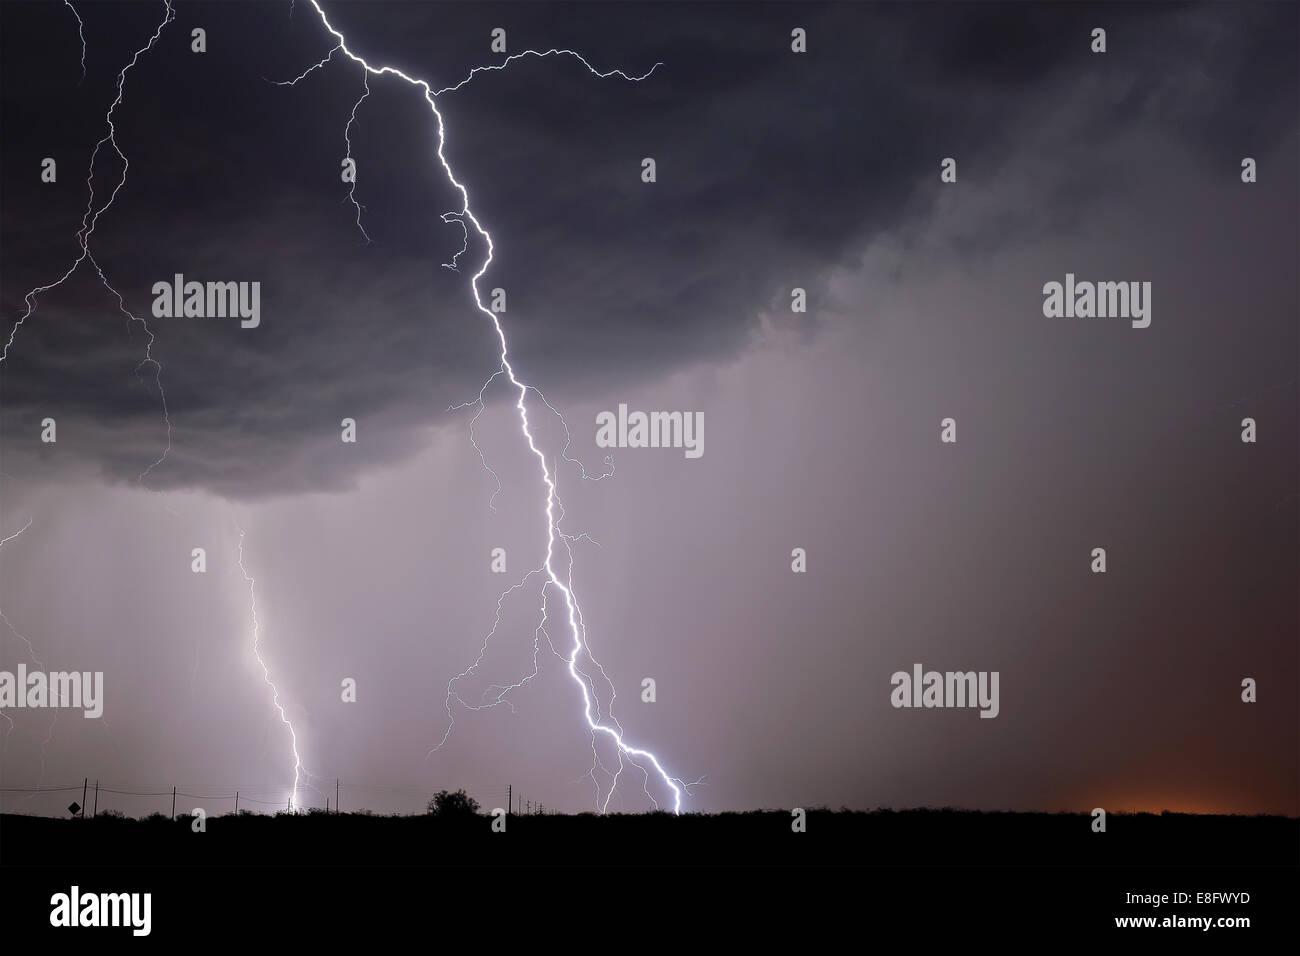 USA, Arizona, Lightning bolts striking near Highway 80 - Stock Image